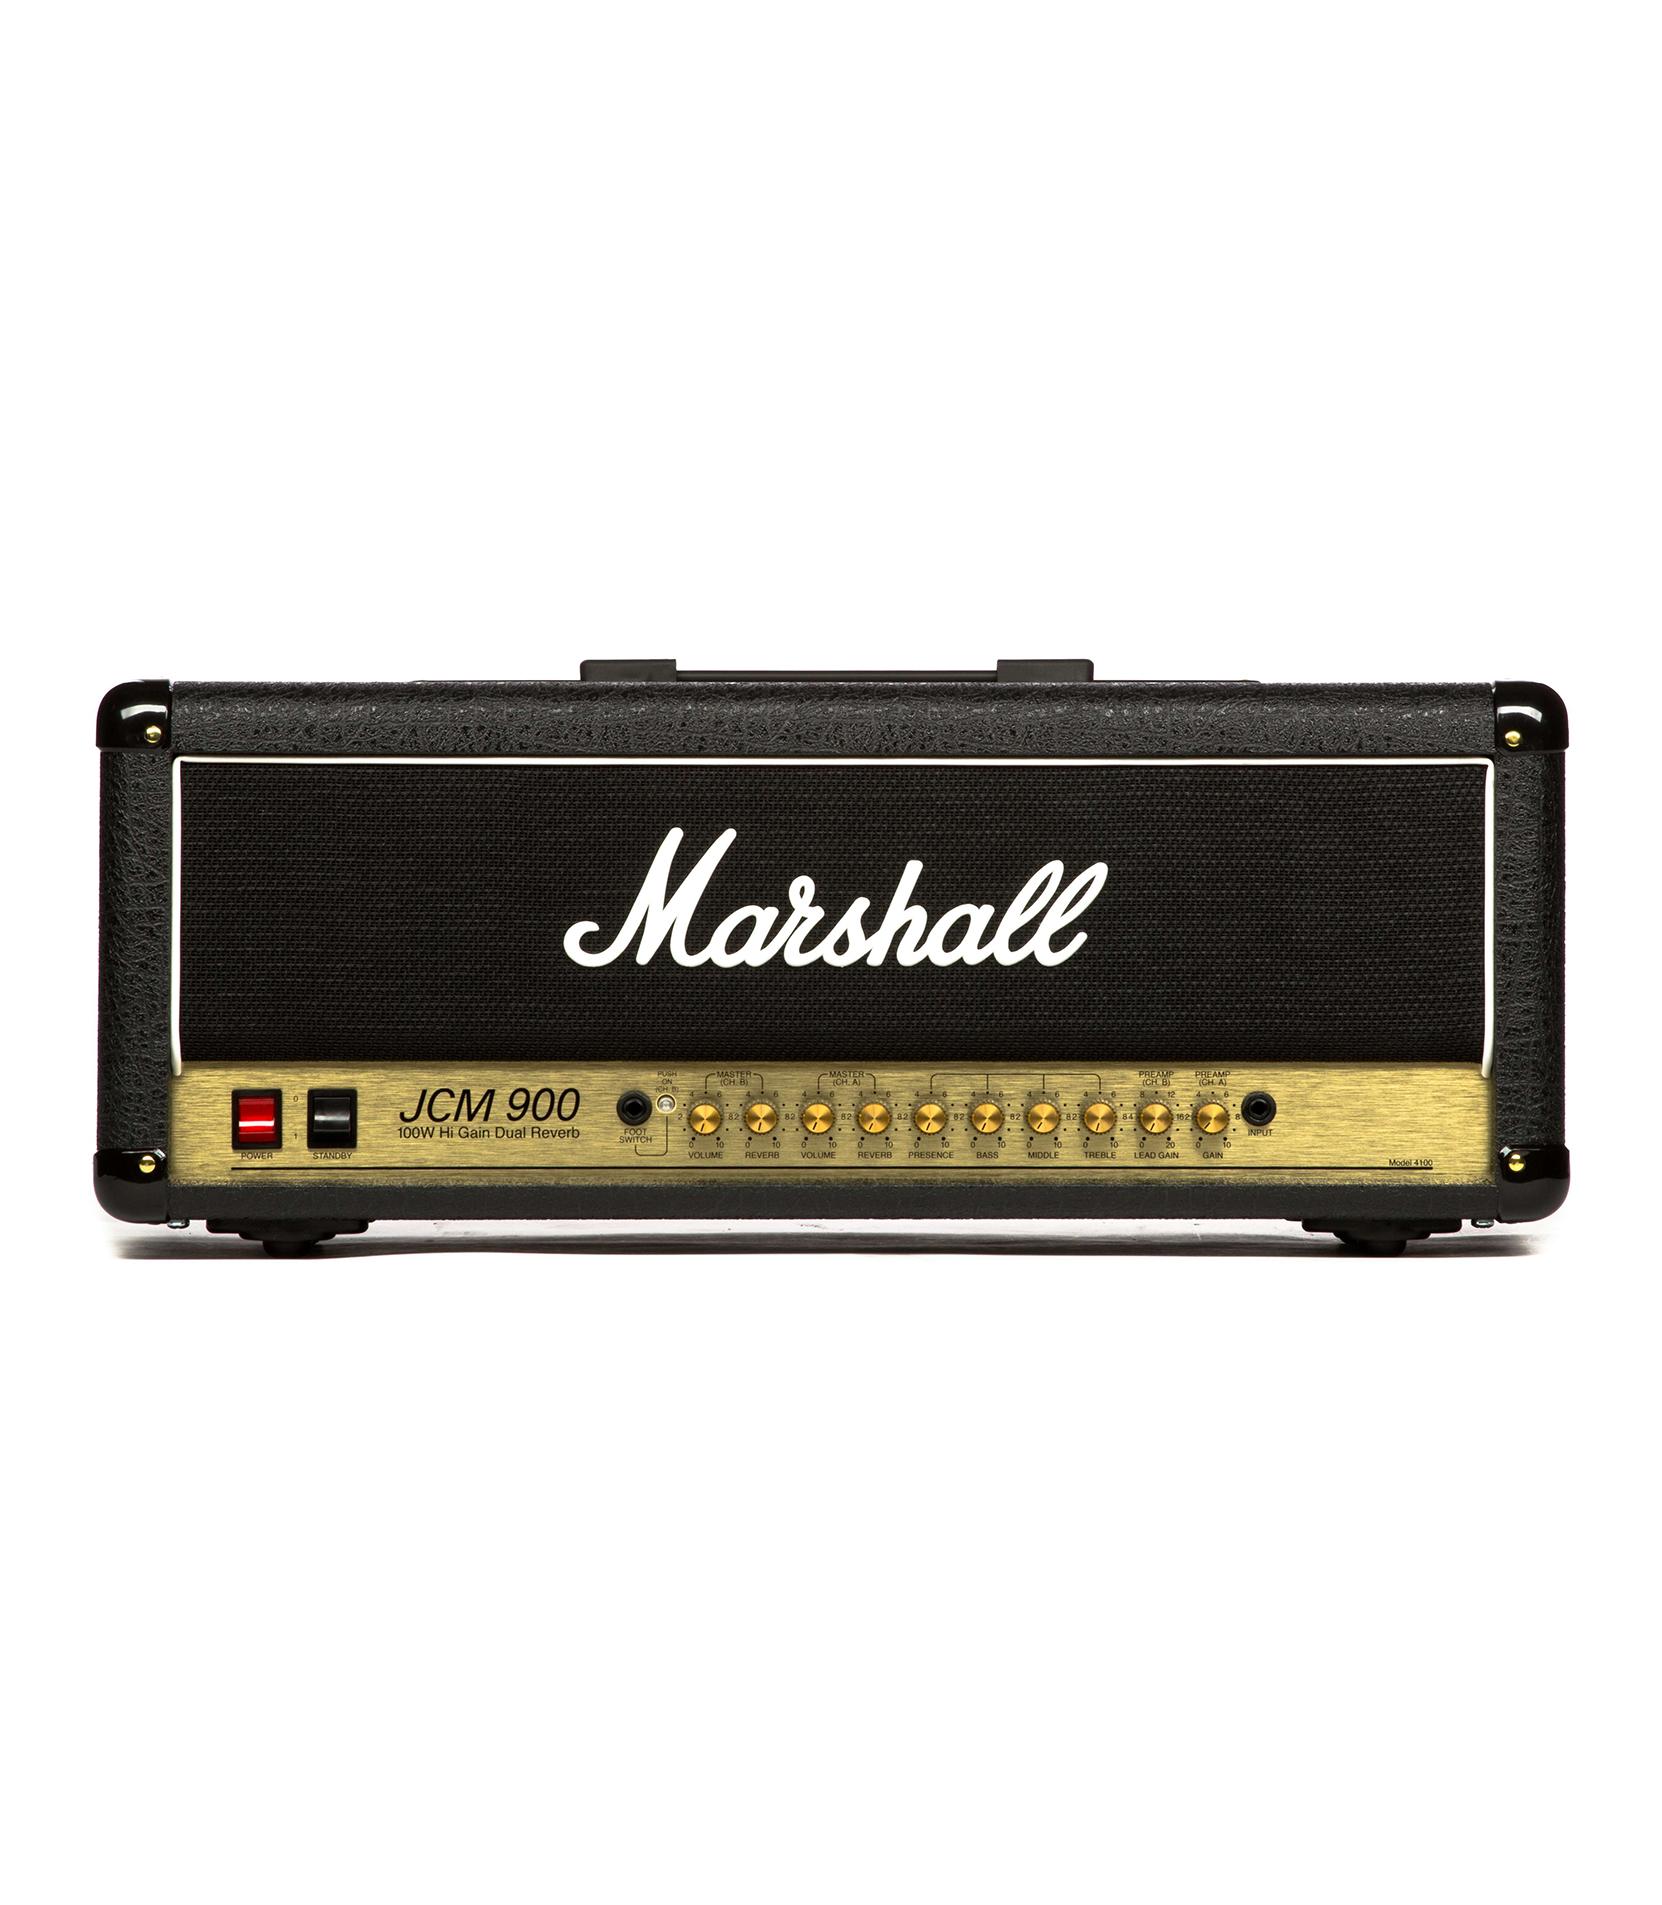 buy marshall 4100 jcm900 guitar amplifier